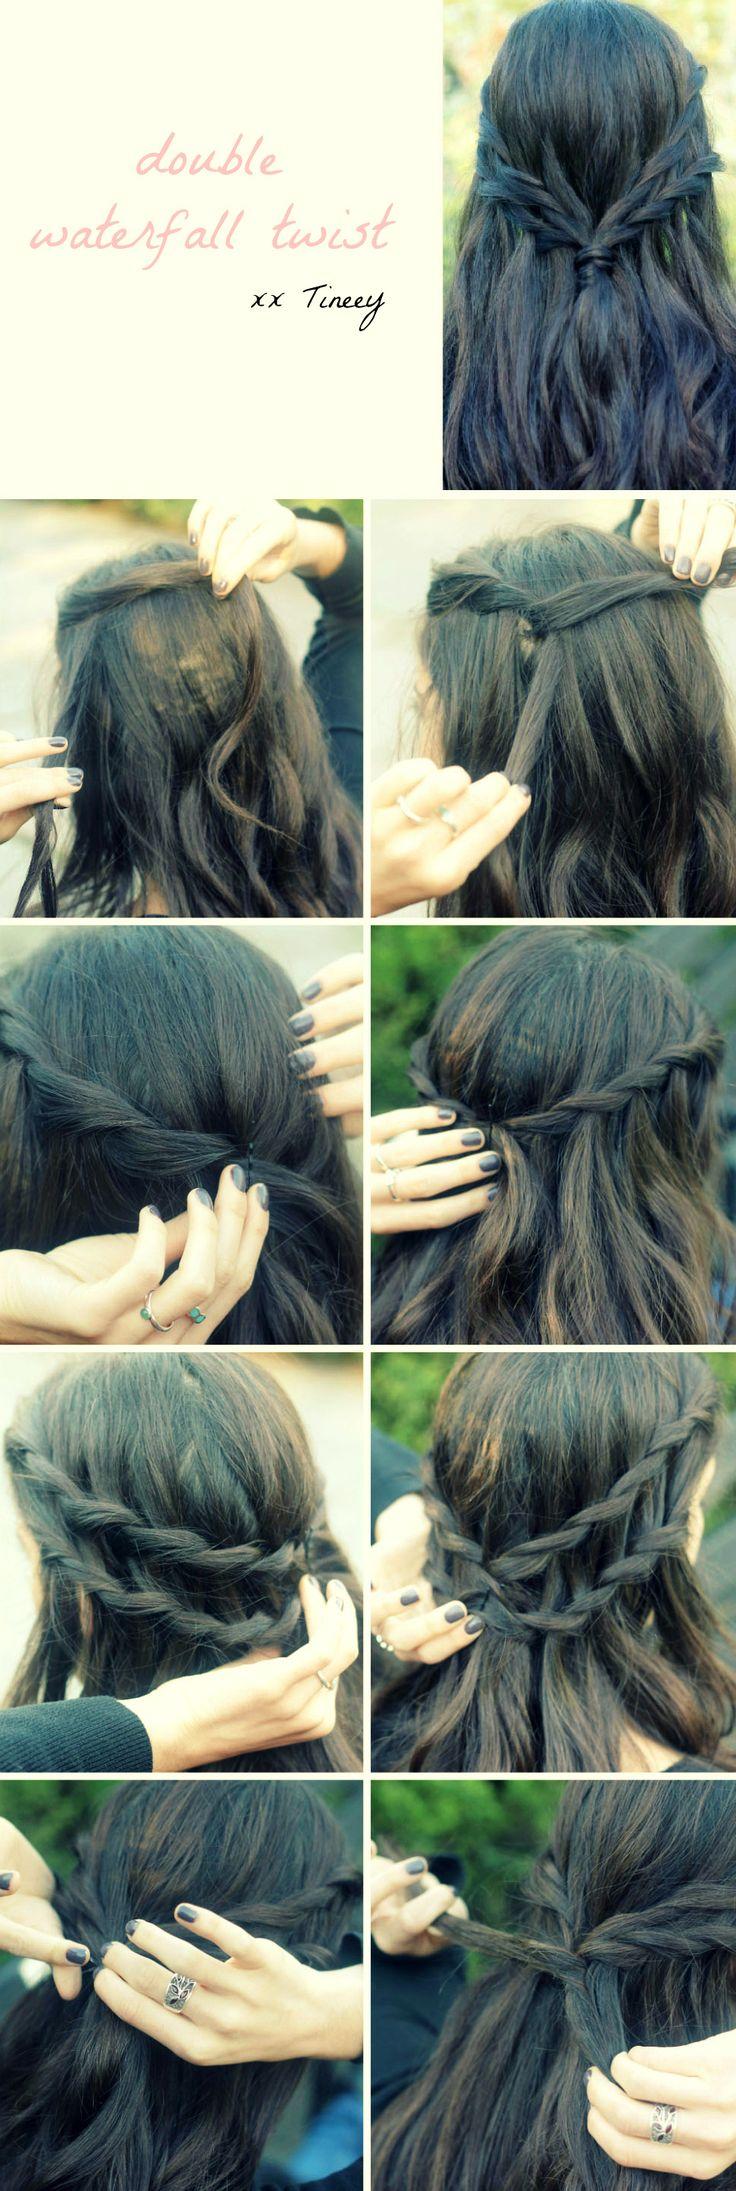 Double Waterfall Twist Hair Tutorial - Tineey